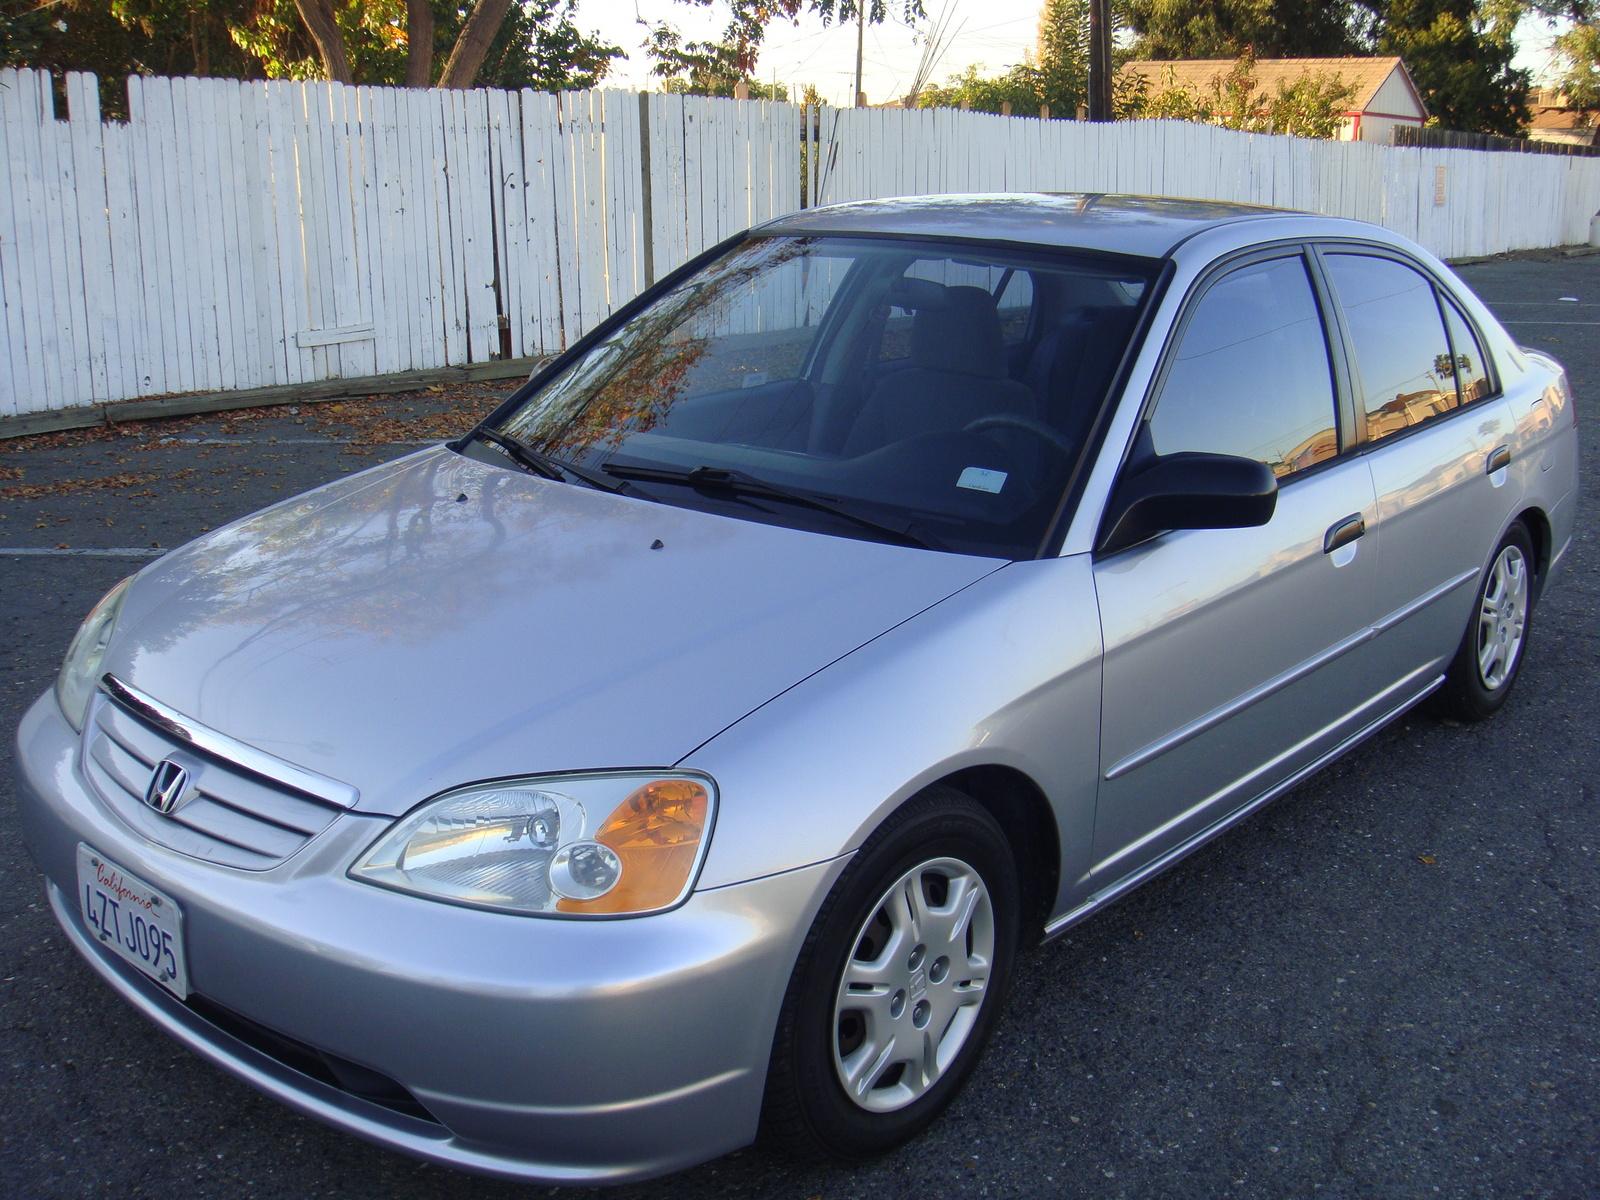 2001 Honda civic lx dimensions